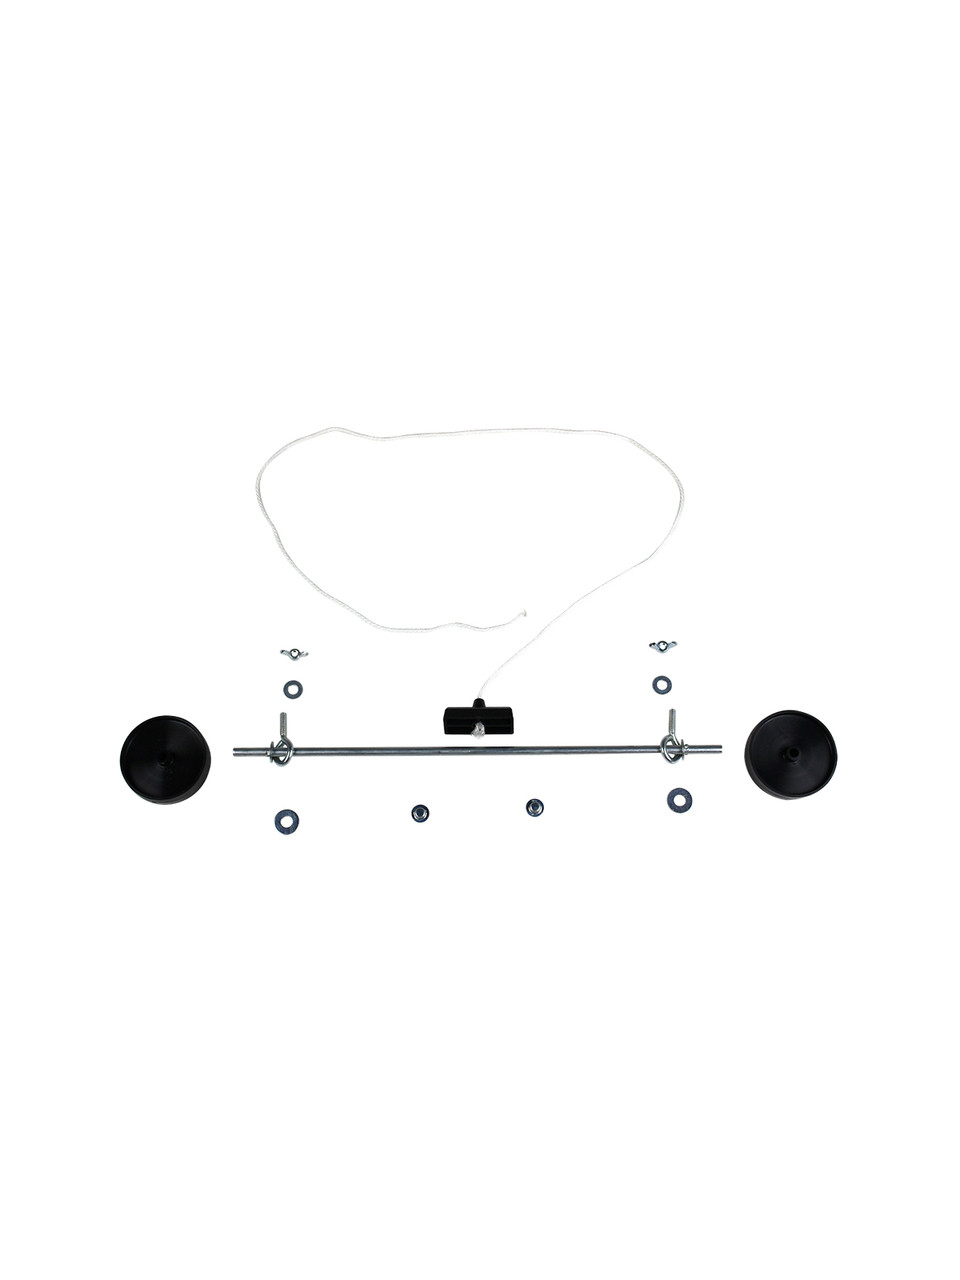 Complete Wheel Kit